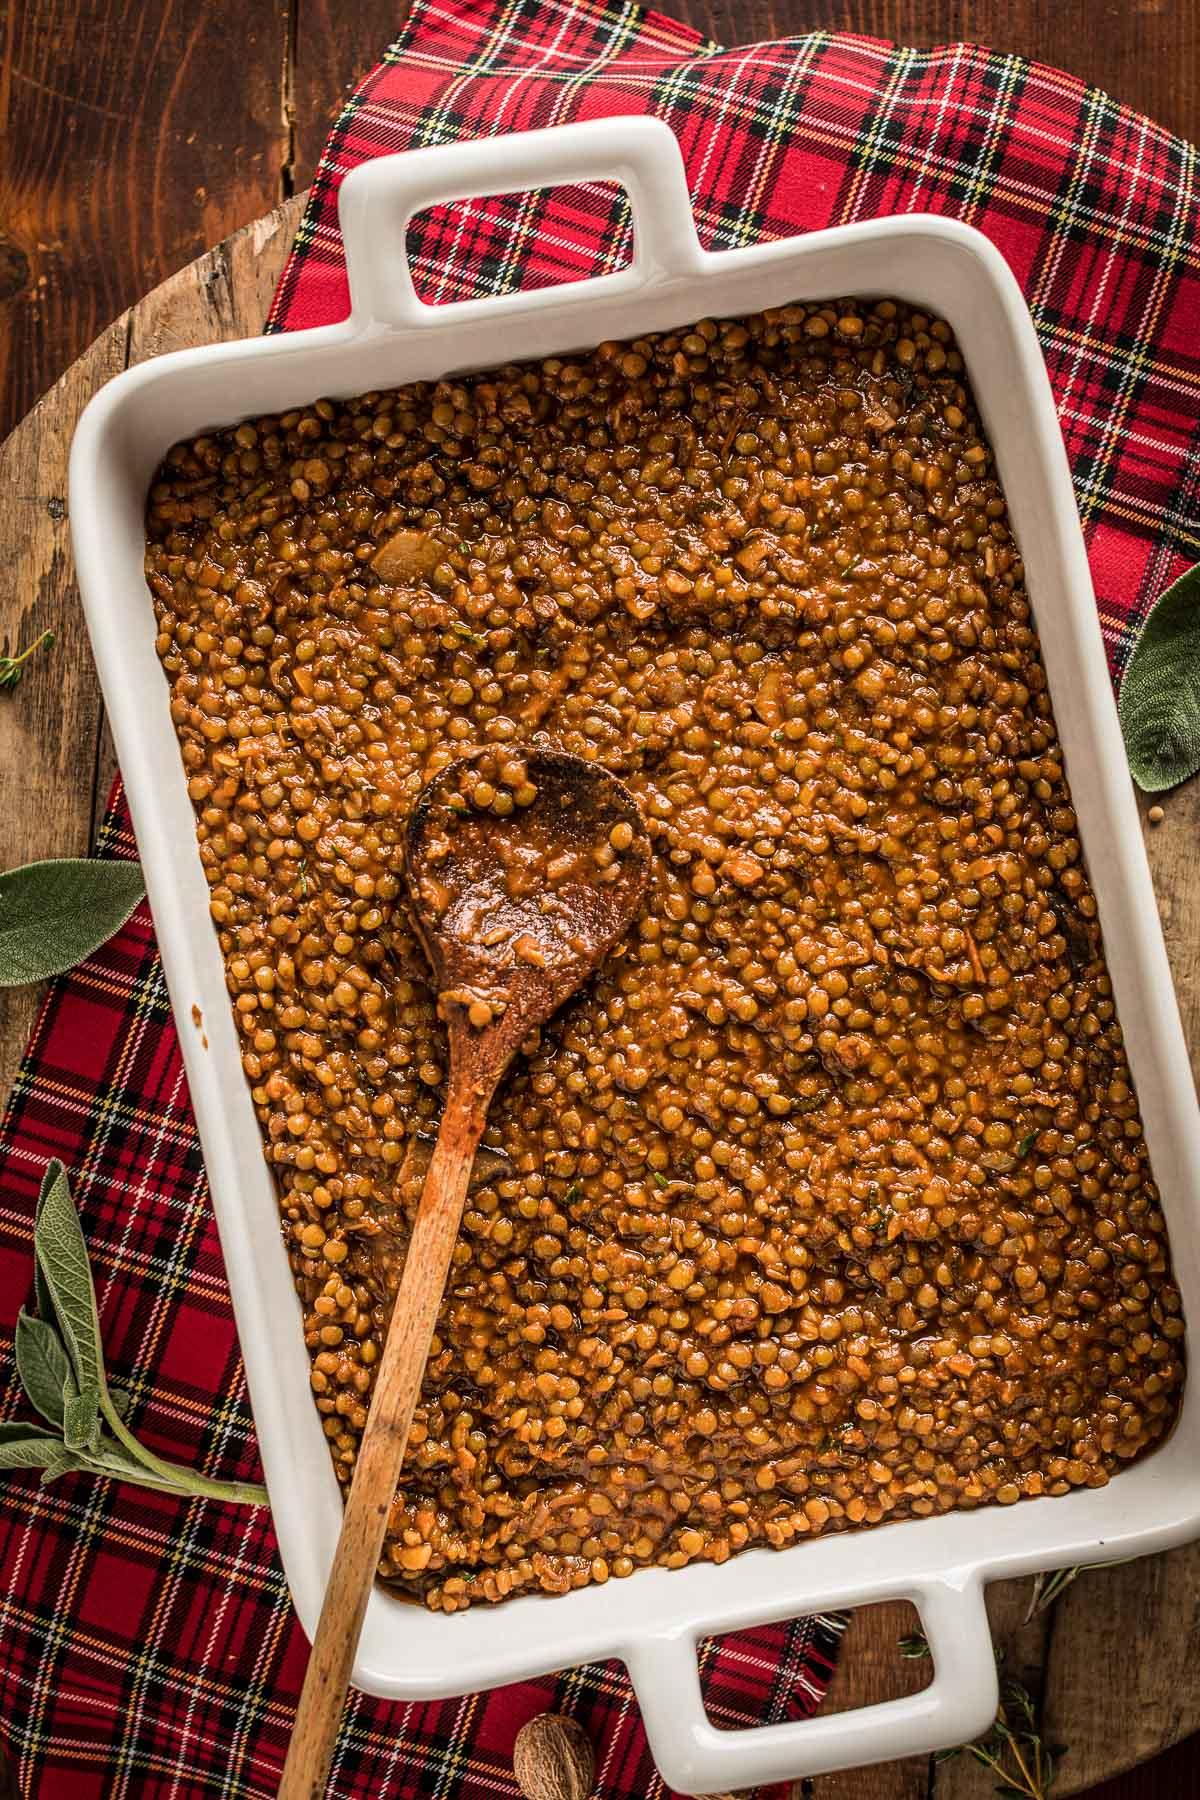 How to make Vegan Lentil Shepherd's Pie healthy cottage pie for Thanksgiving come fare la Shepherd's Pie di lenticchie con ragù di lenticchie funghi e purè di patate